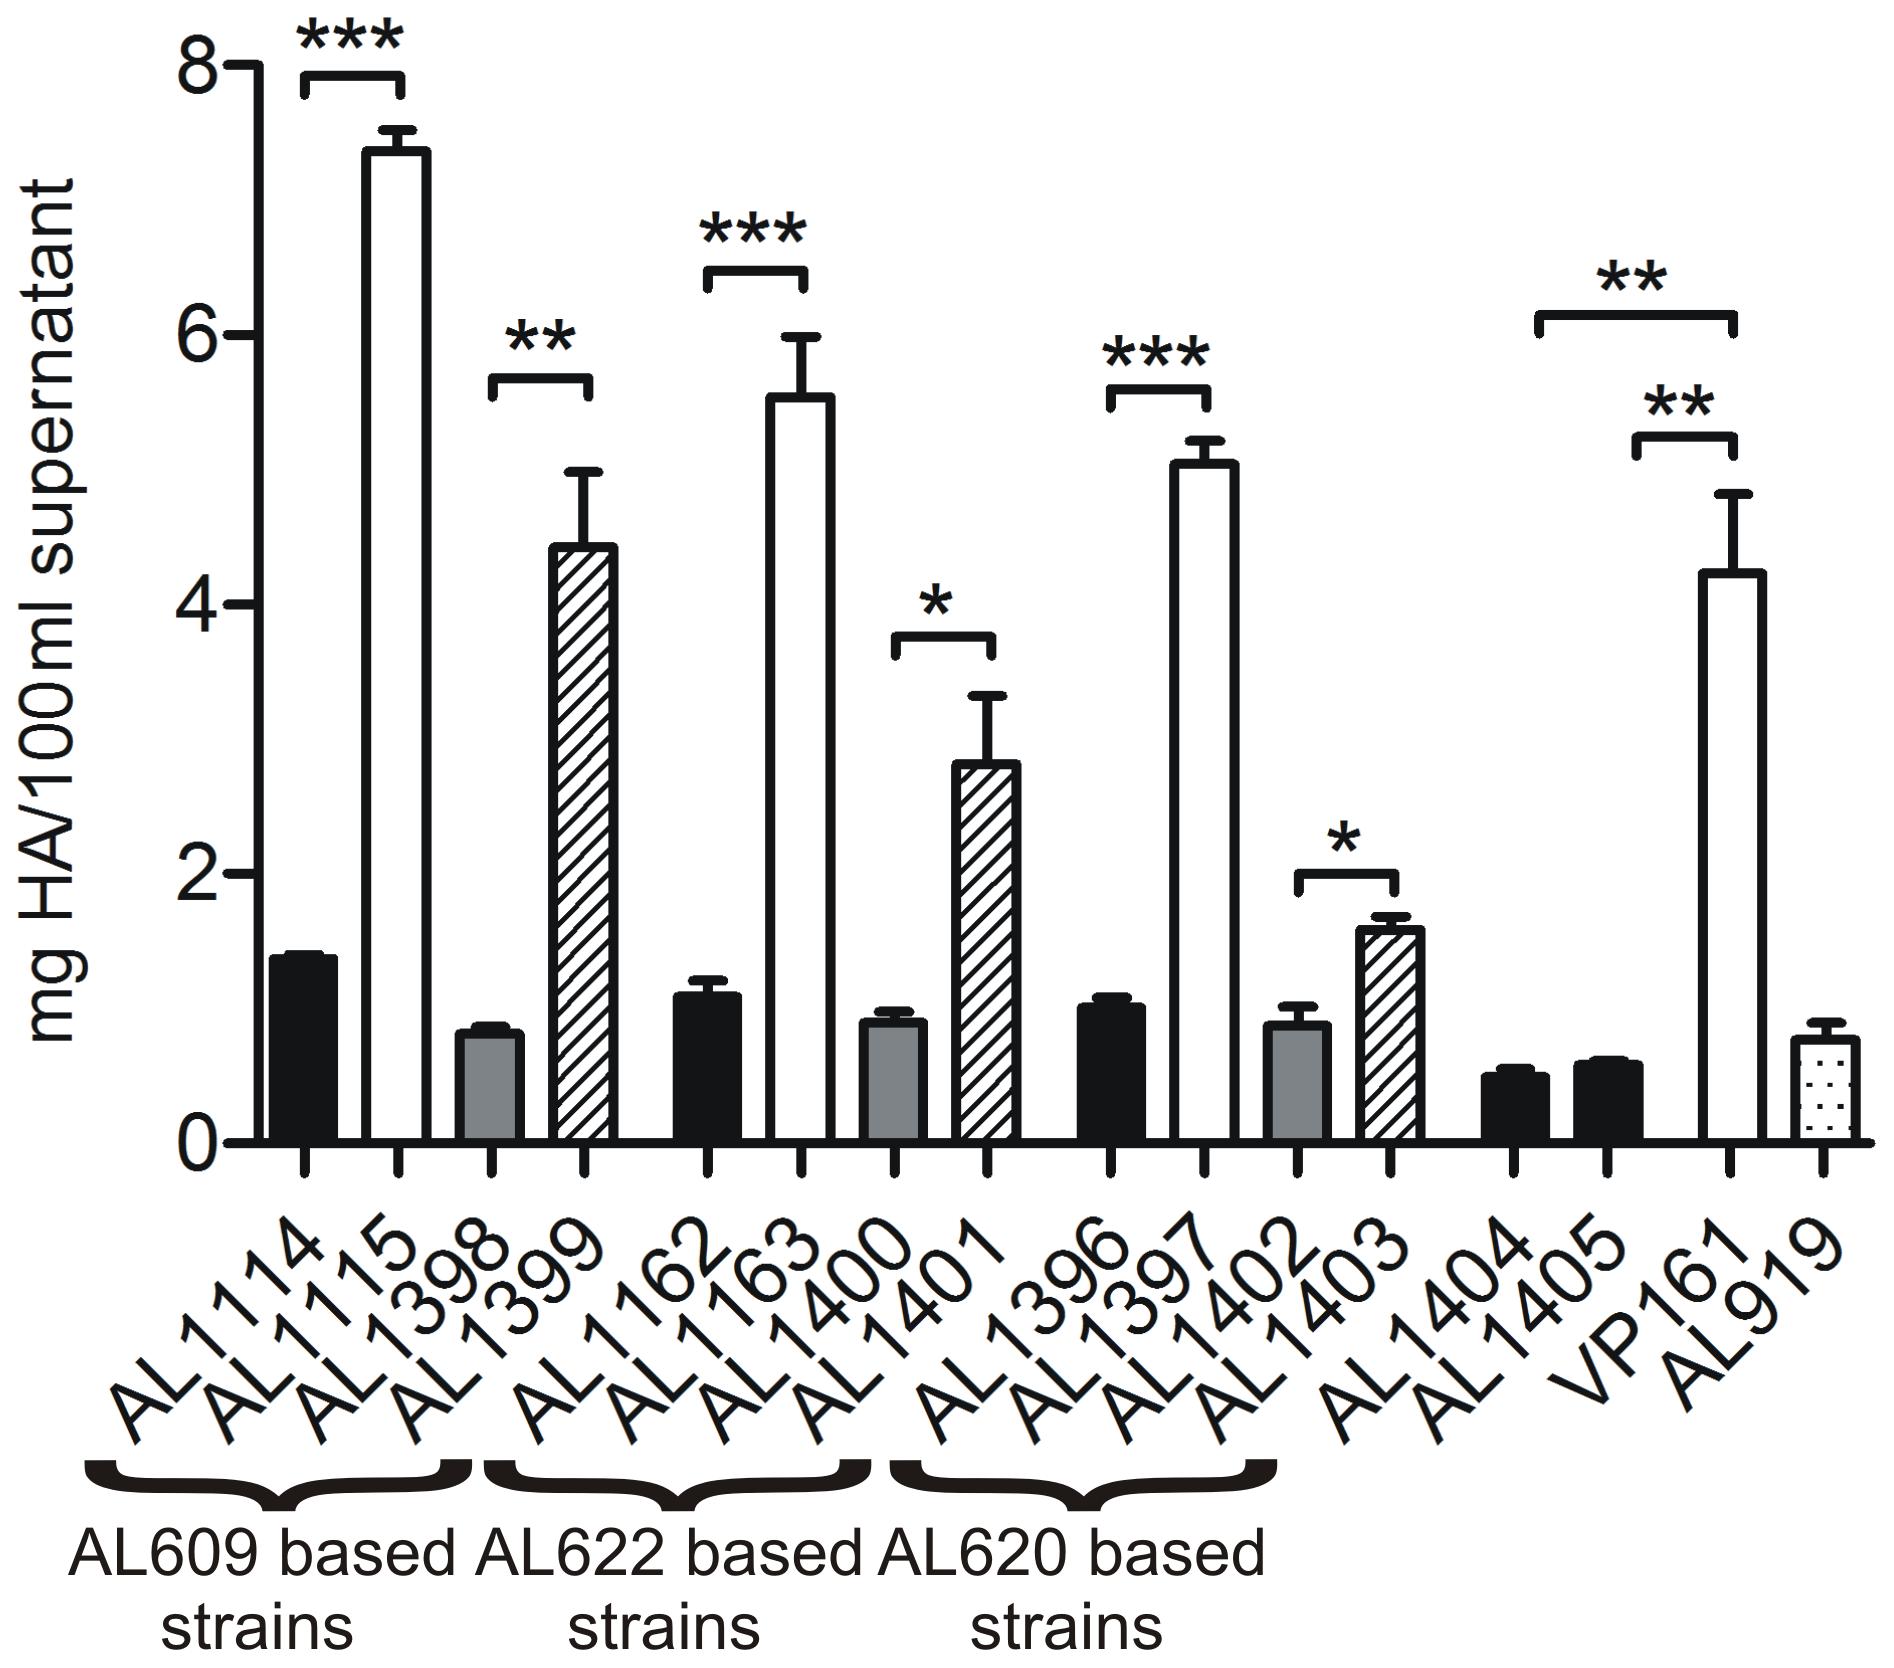 Hyaluronic acid (HA) capsular polysaccharide produced by <i>P. multocida</i> strains.